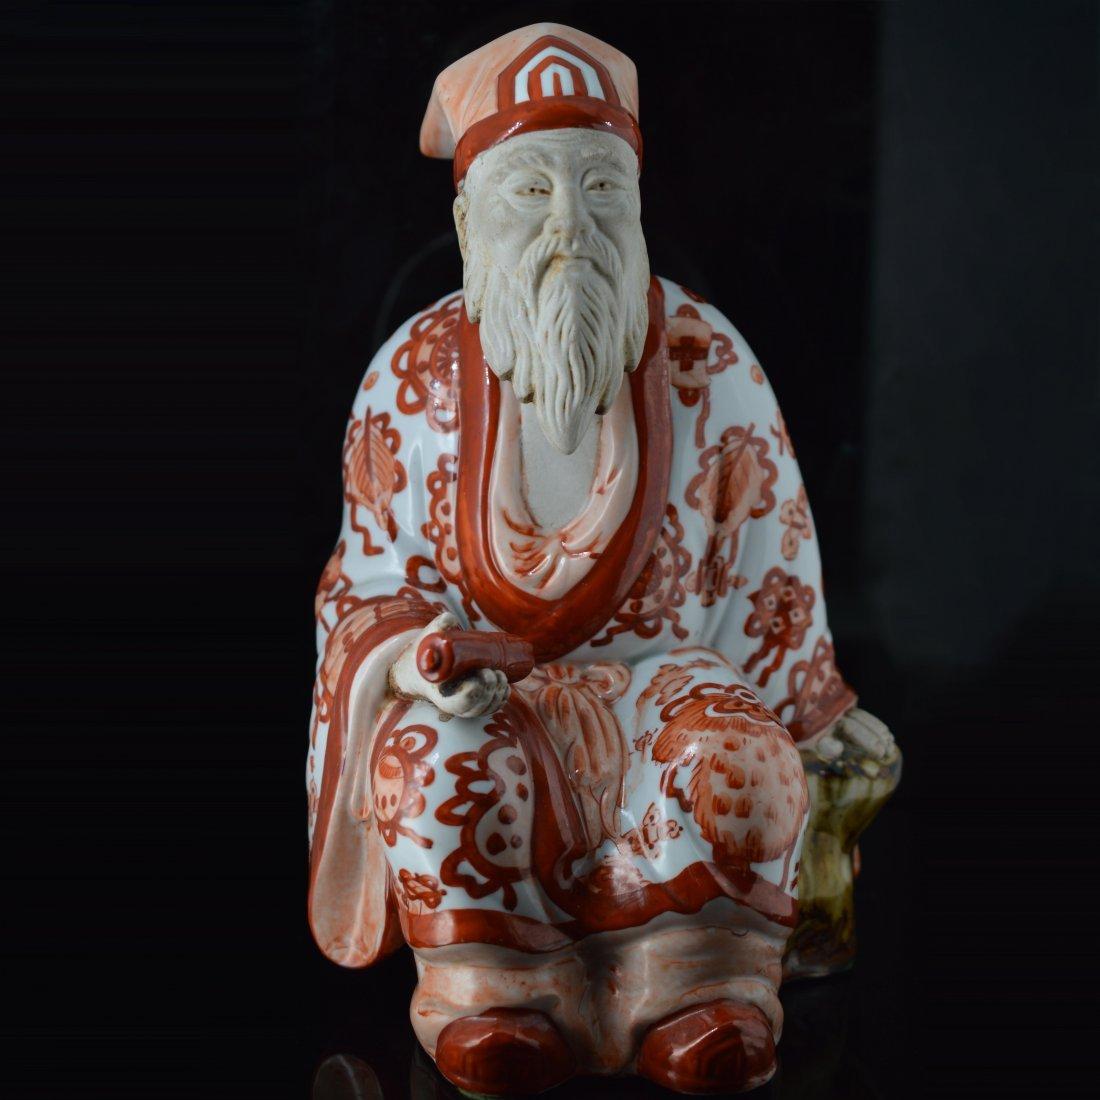 Red Glazed Japanese Porcelain Figure Ornament